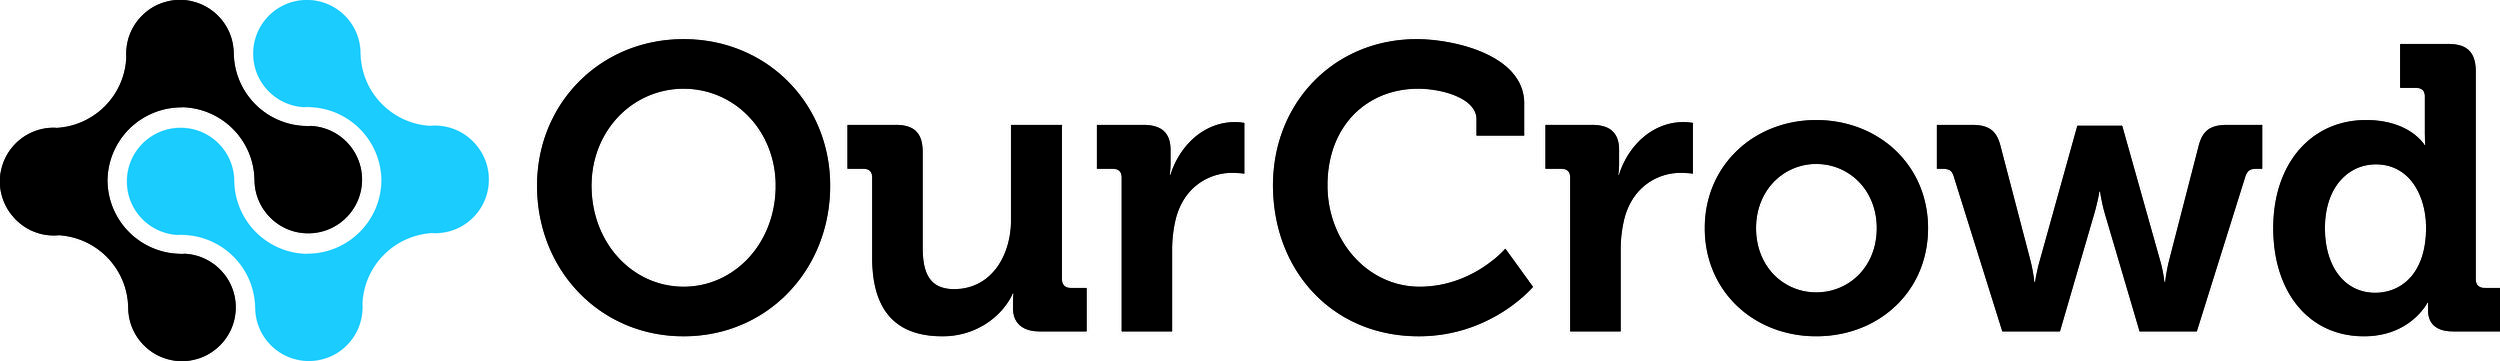 OurCrowd-White-Logo-Hi-Res.jpg